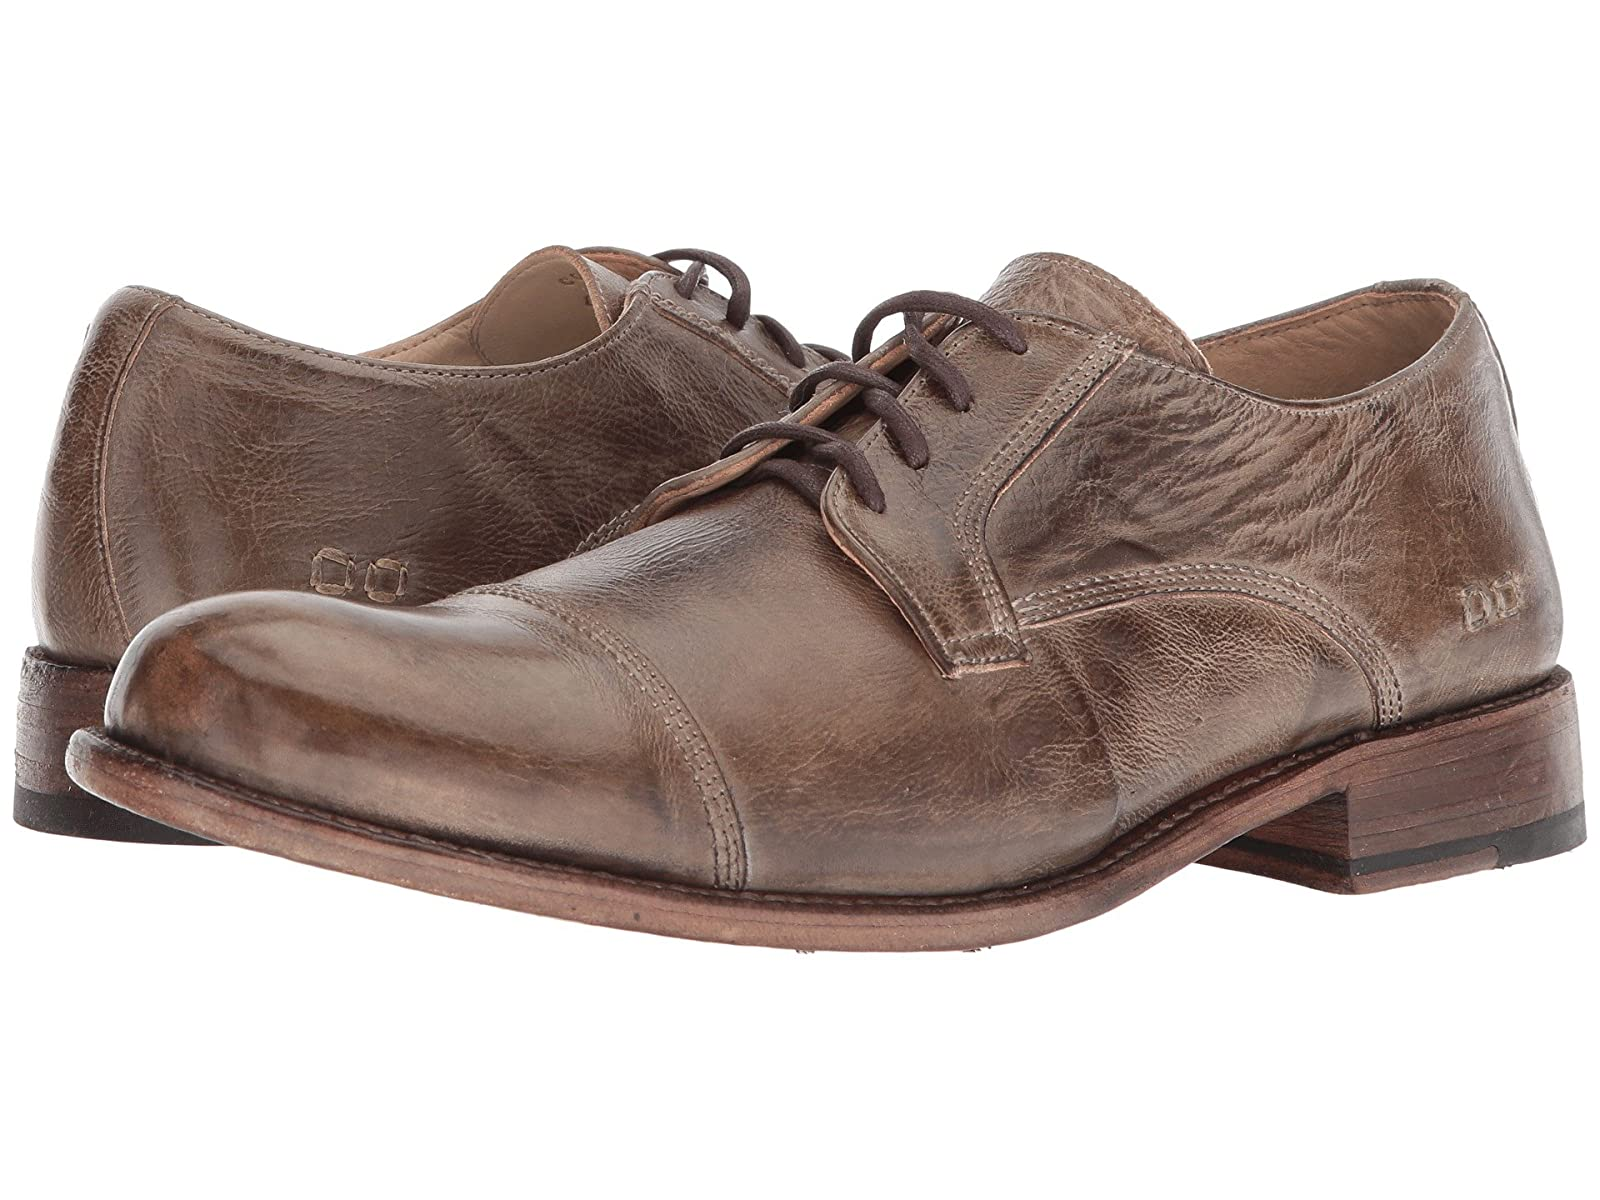 Bed Stu GenoaAtmospheric grades have affordable shoes